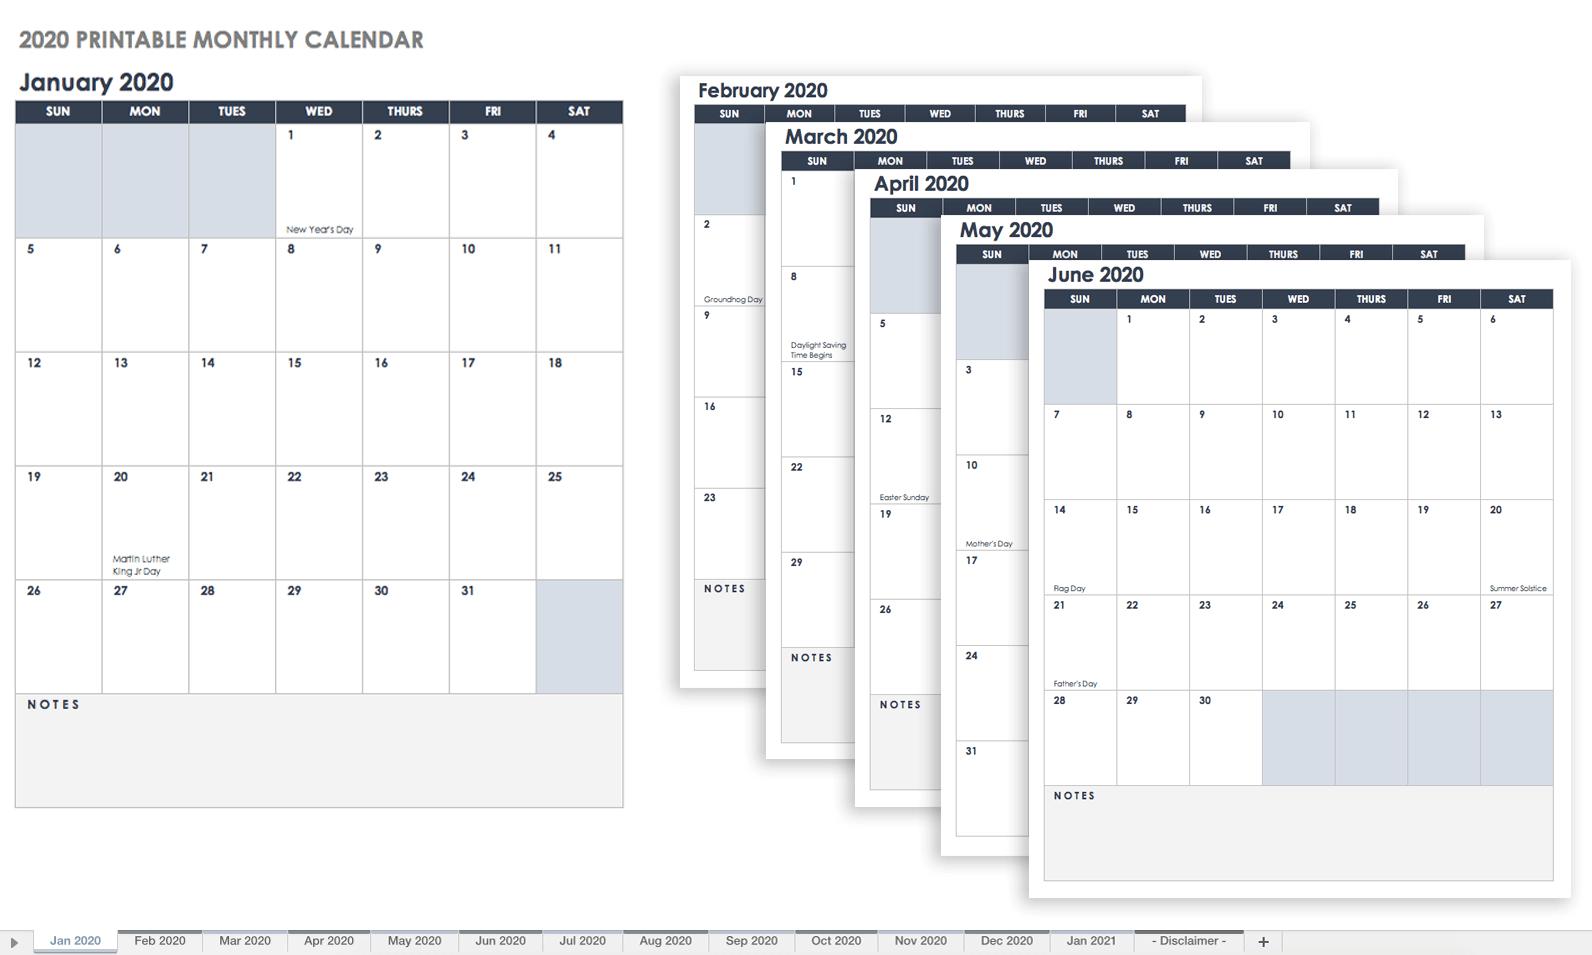 Free Blank Calendar Templates - Smartsheet intended for Two Week Blank Calendar Template